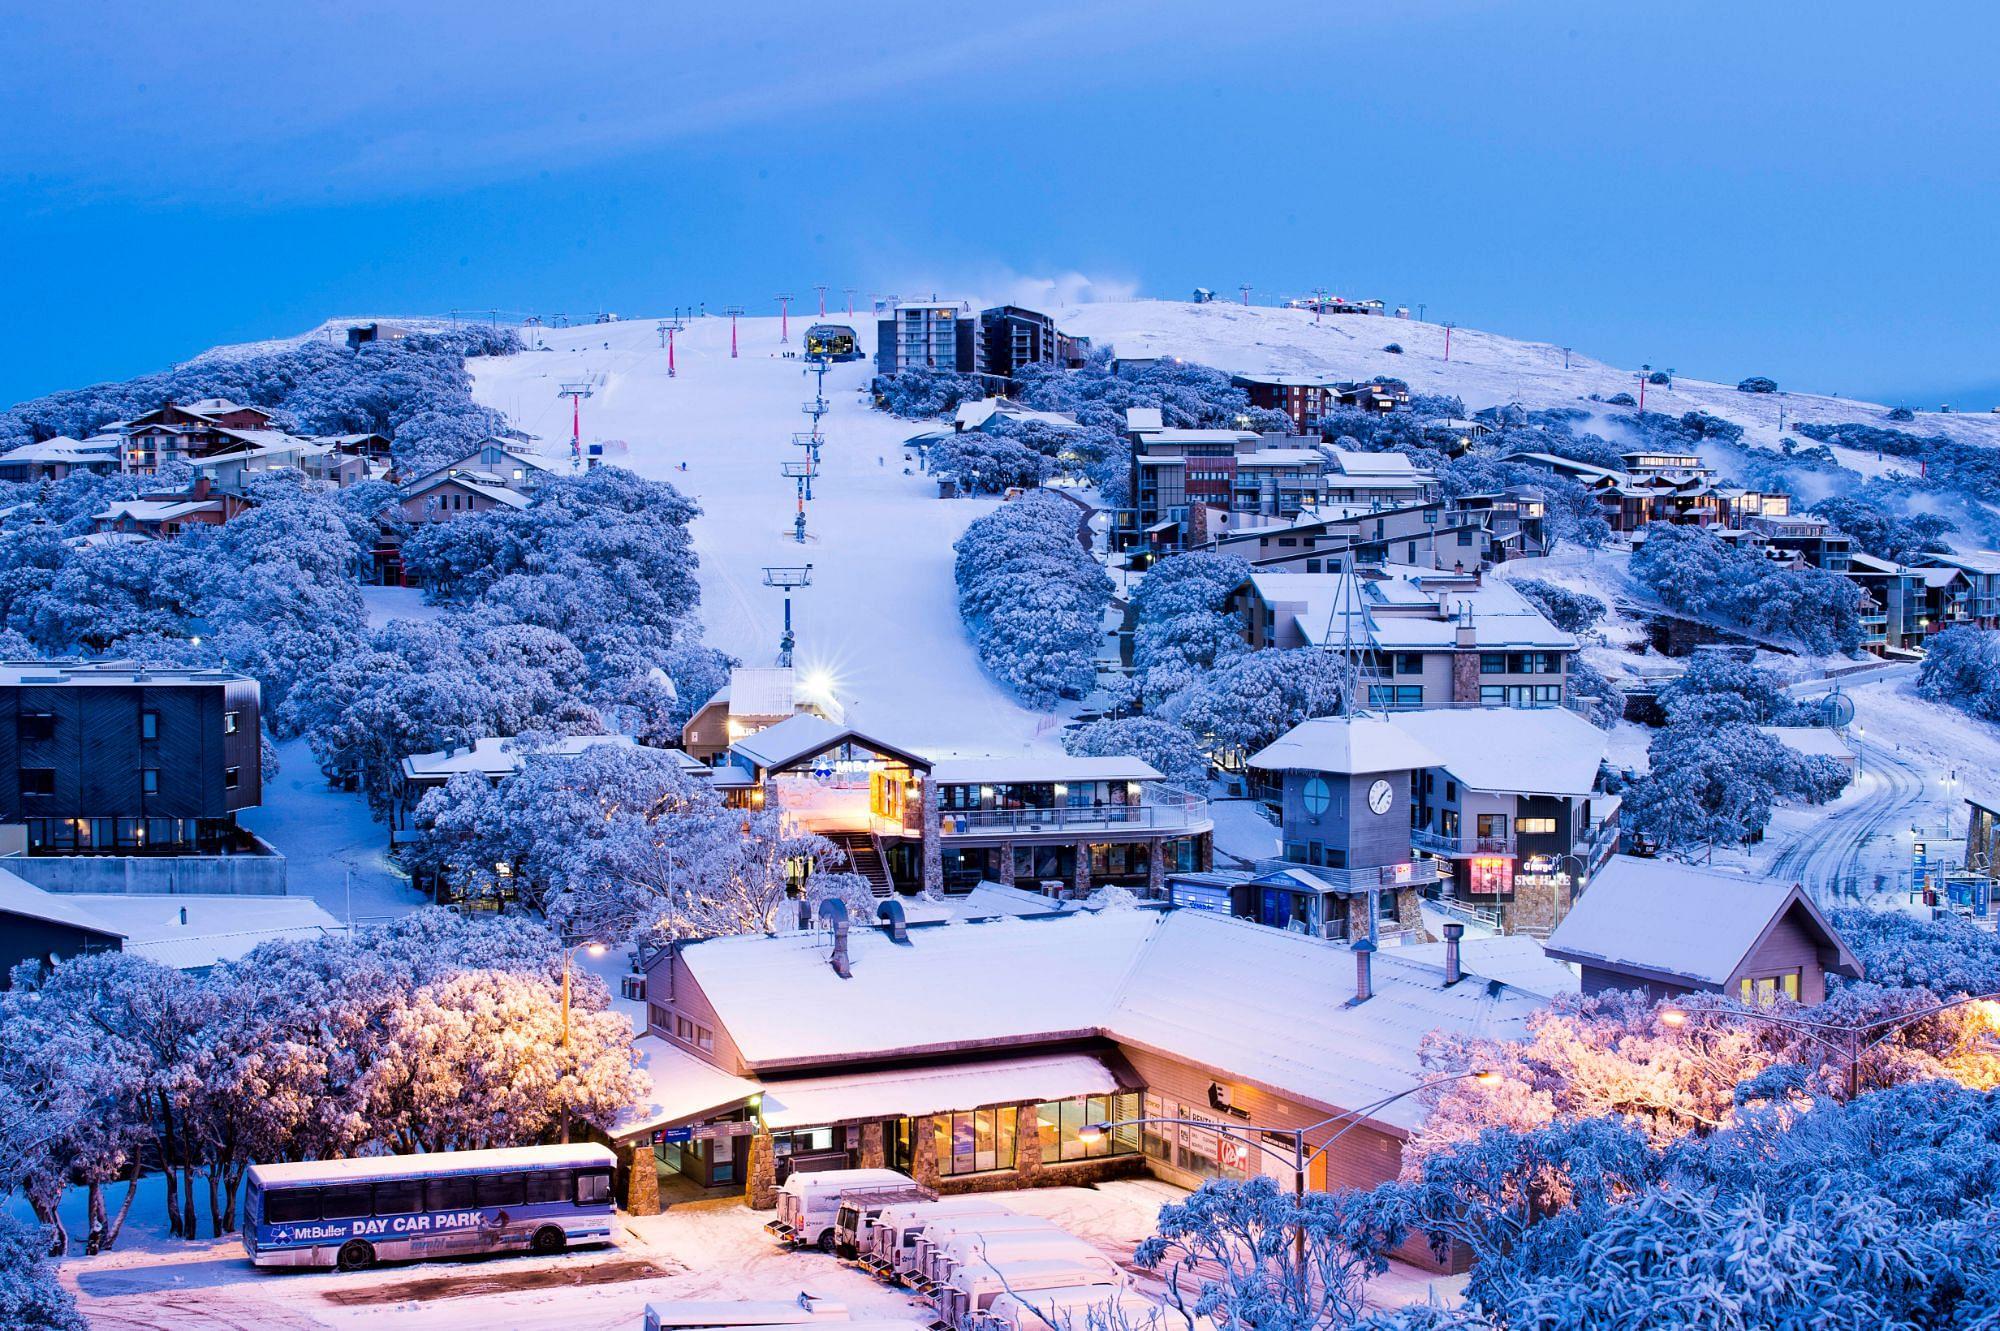 Winter holidays in Mount Buller, Victoria, Australia